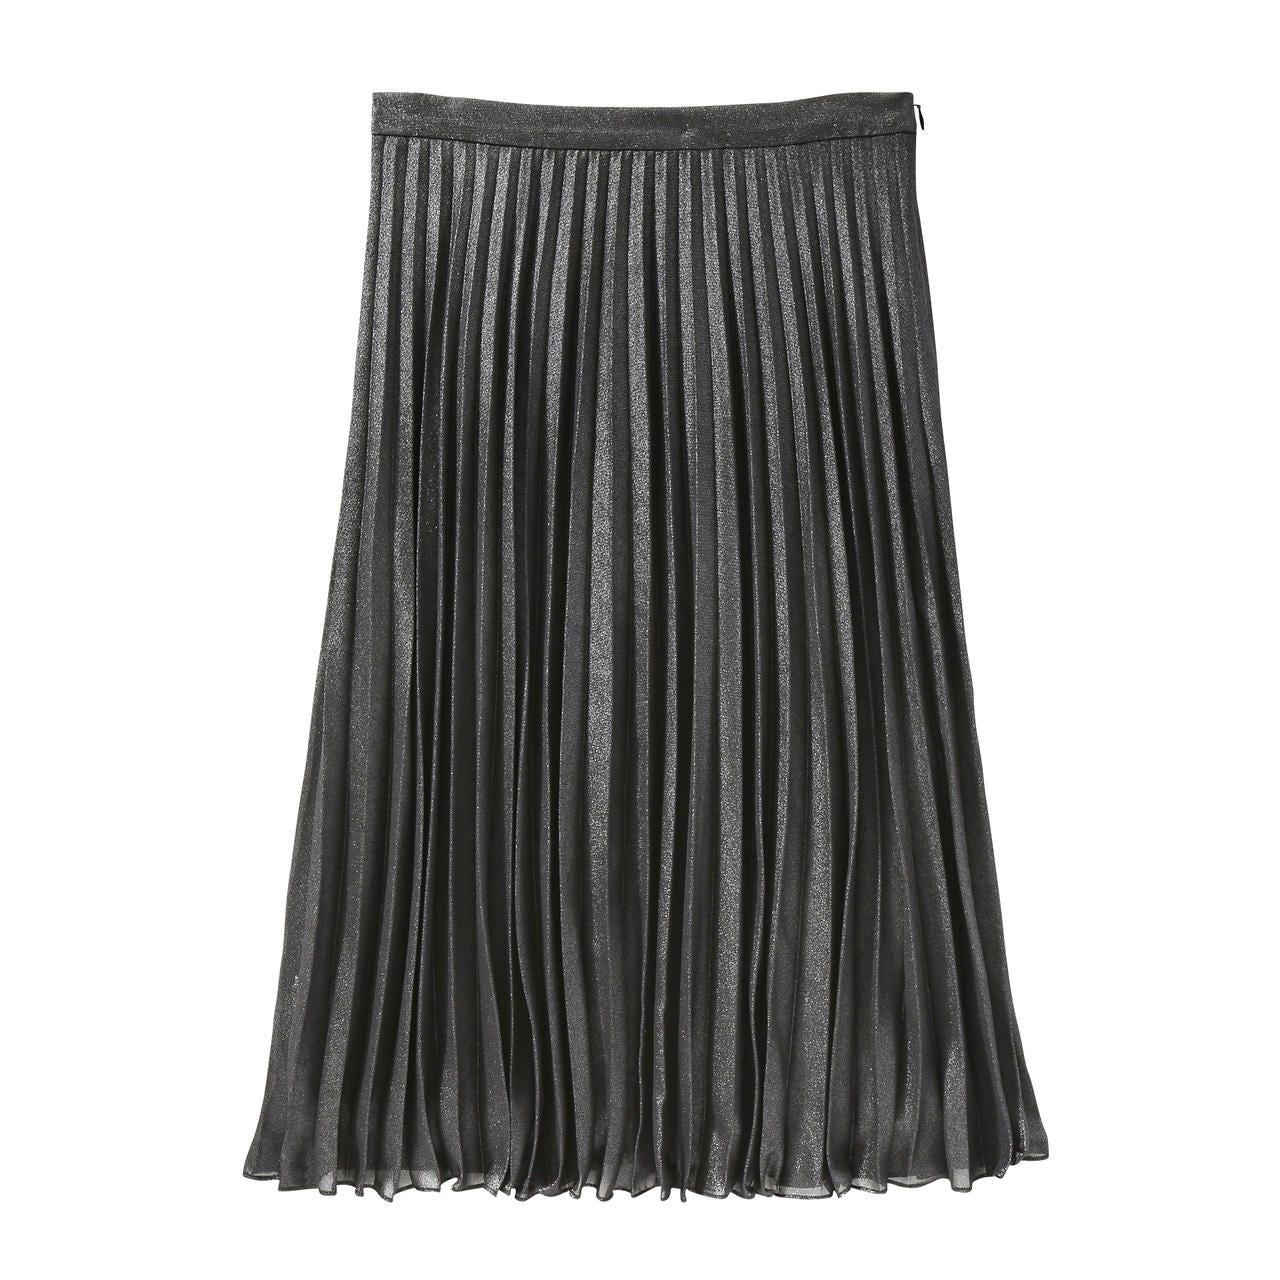 9e3cbf4d1c Classy Lingerie Looks Layered Outfits